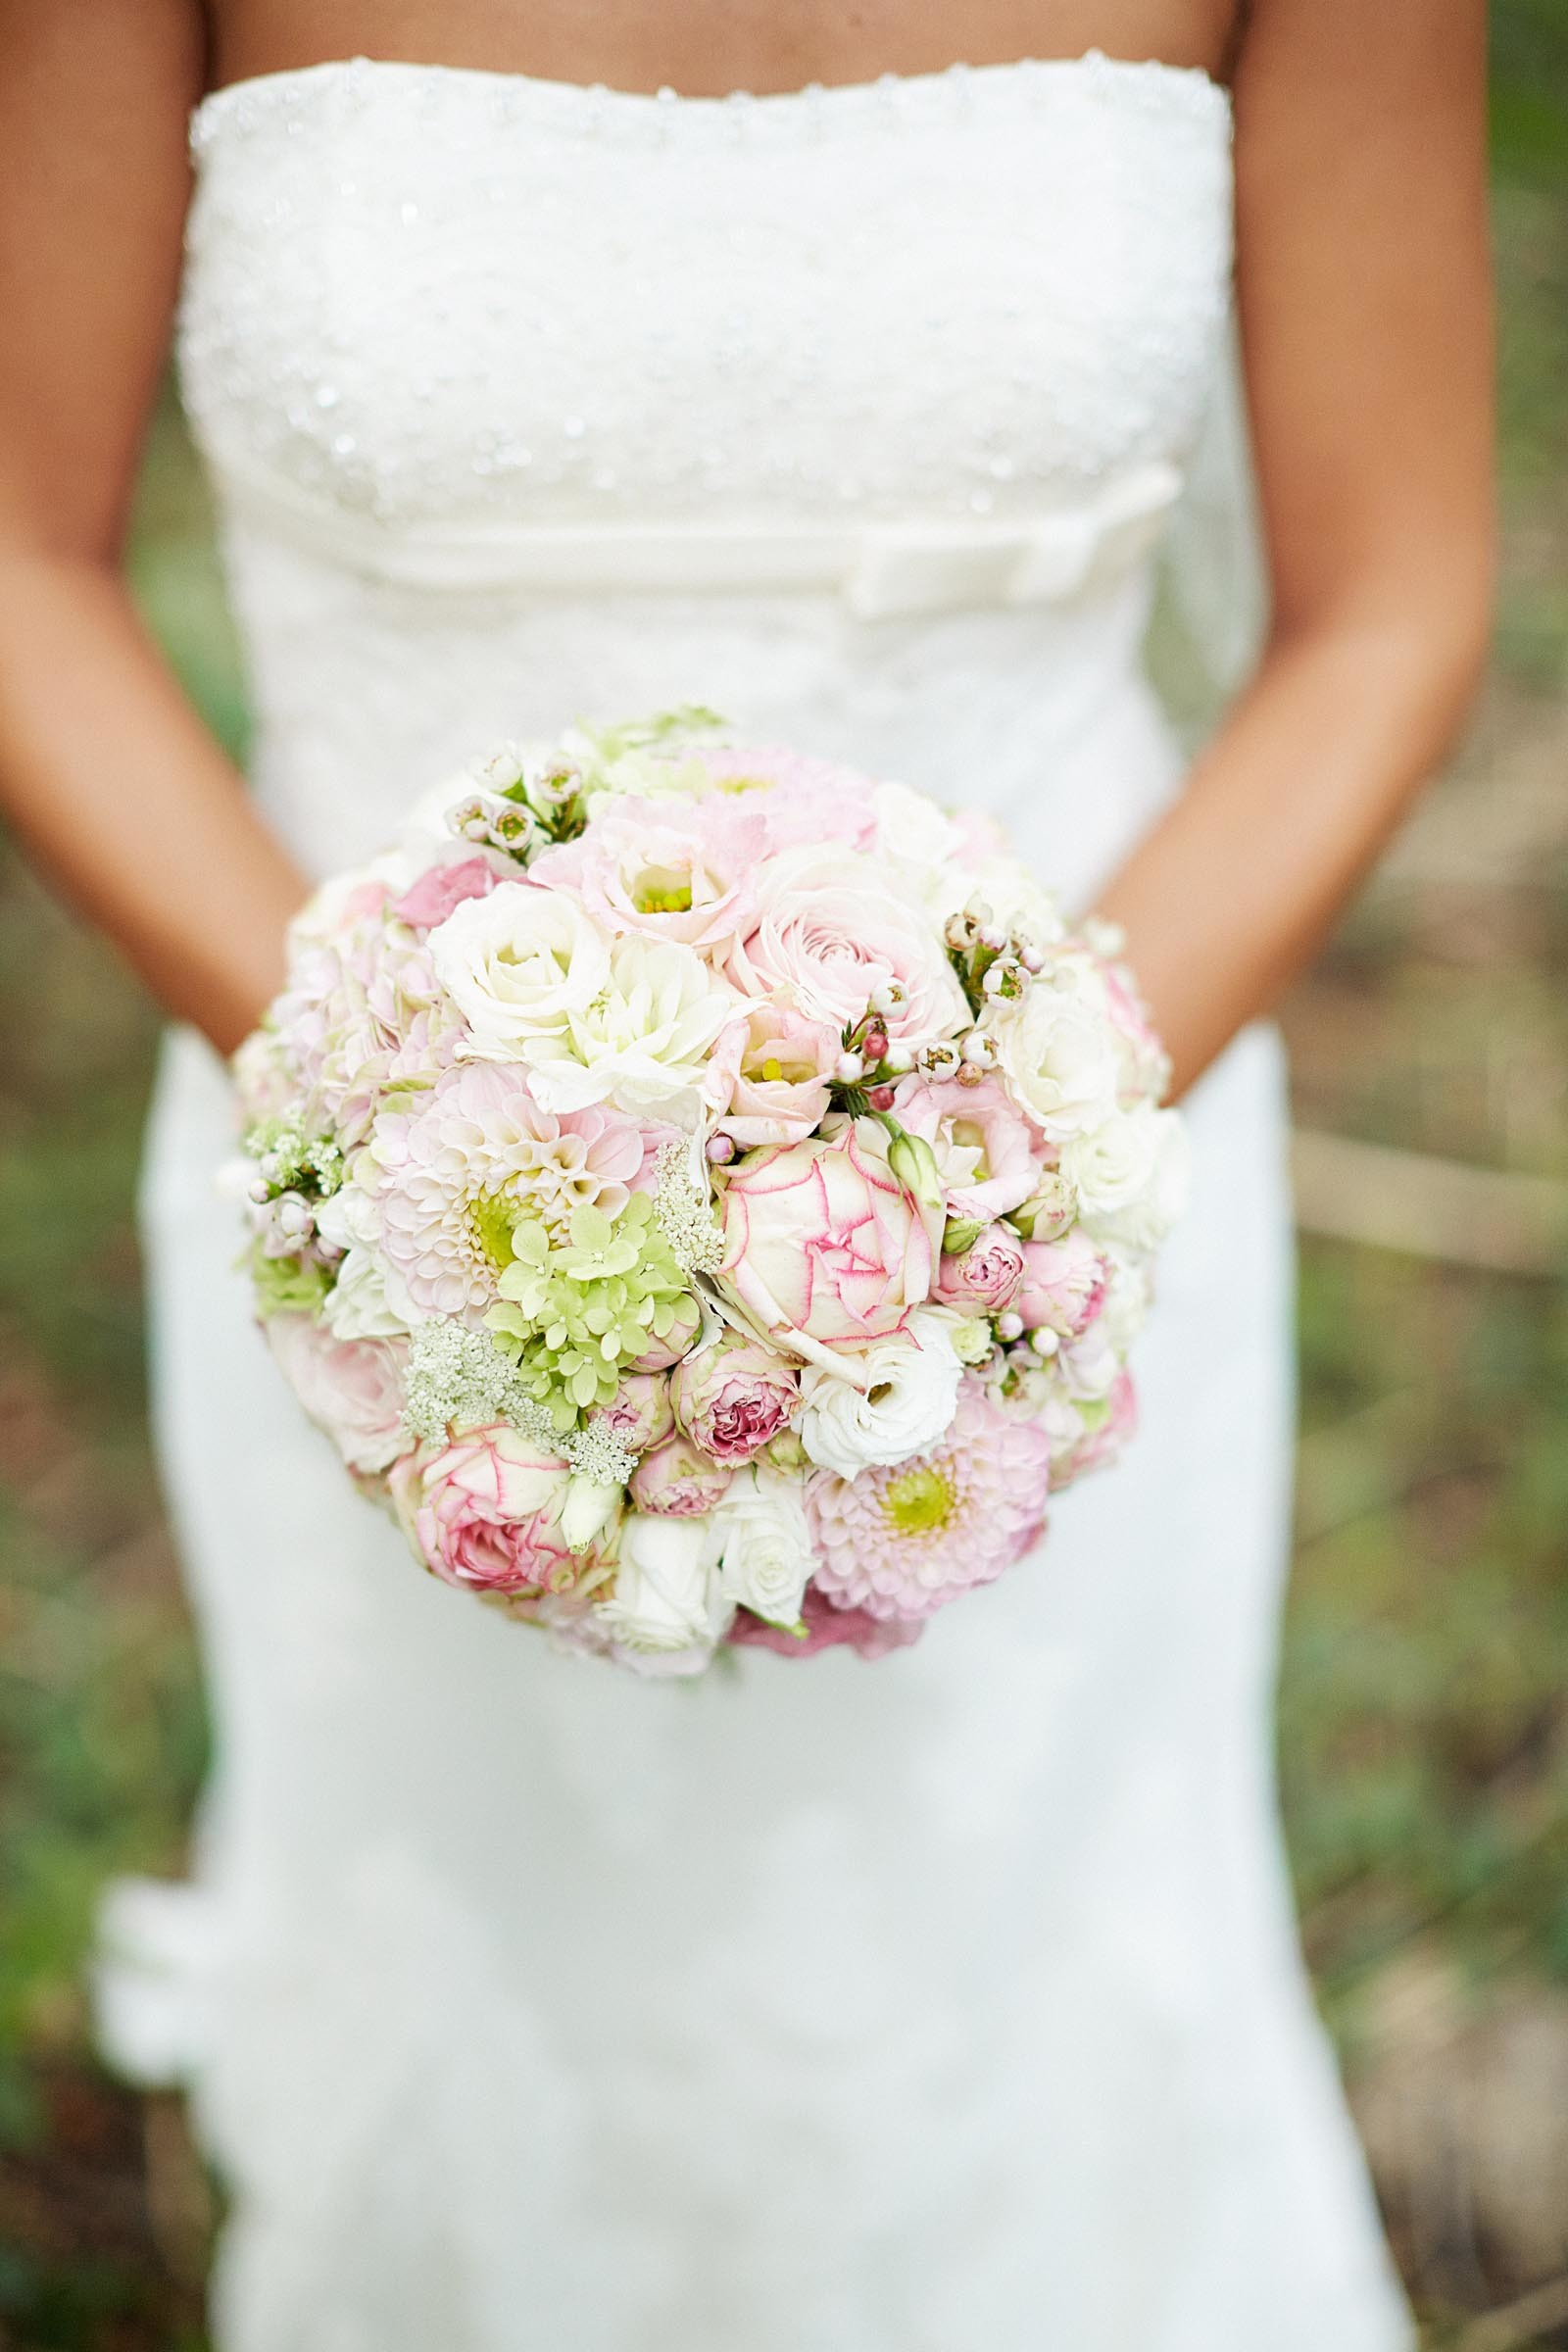 Brautkugel in Hellrosa